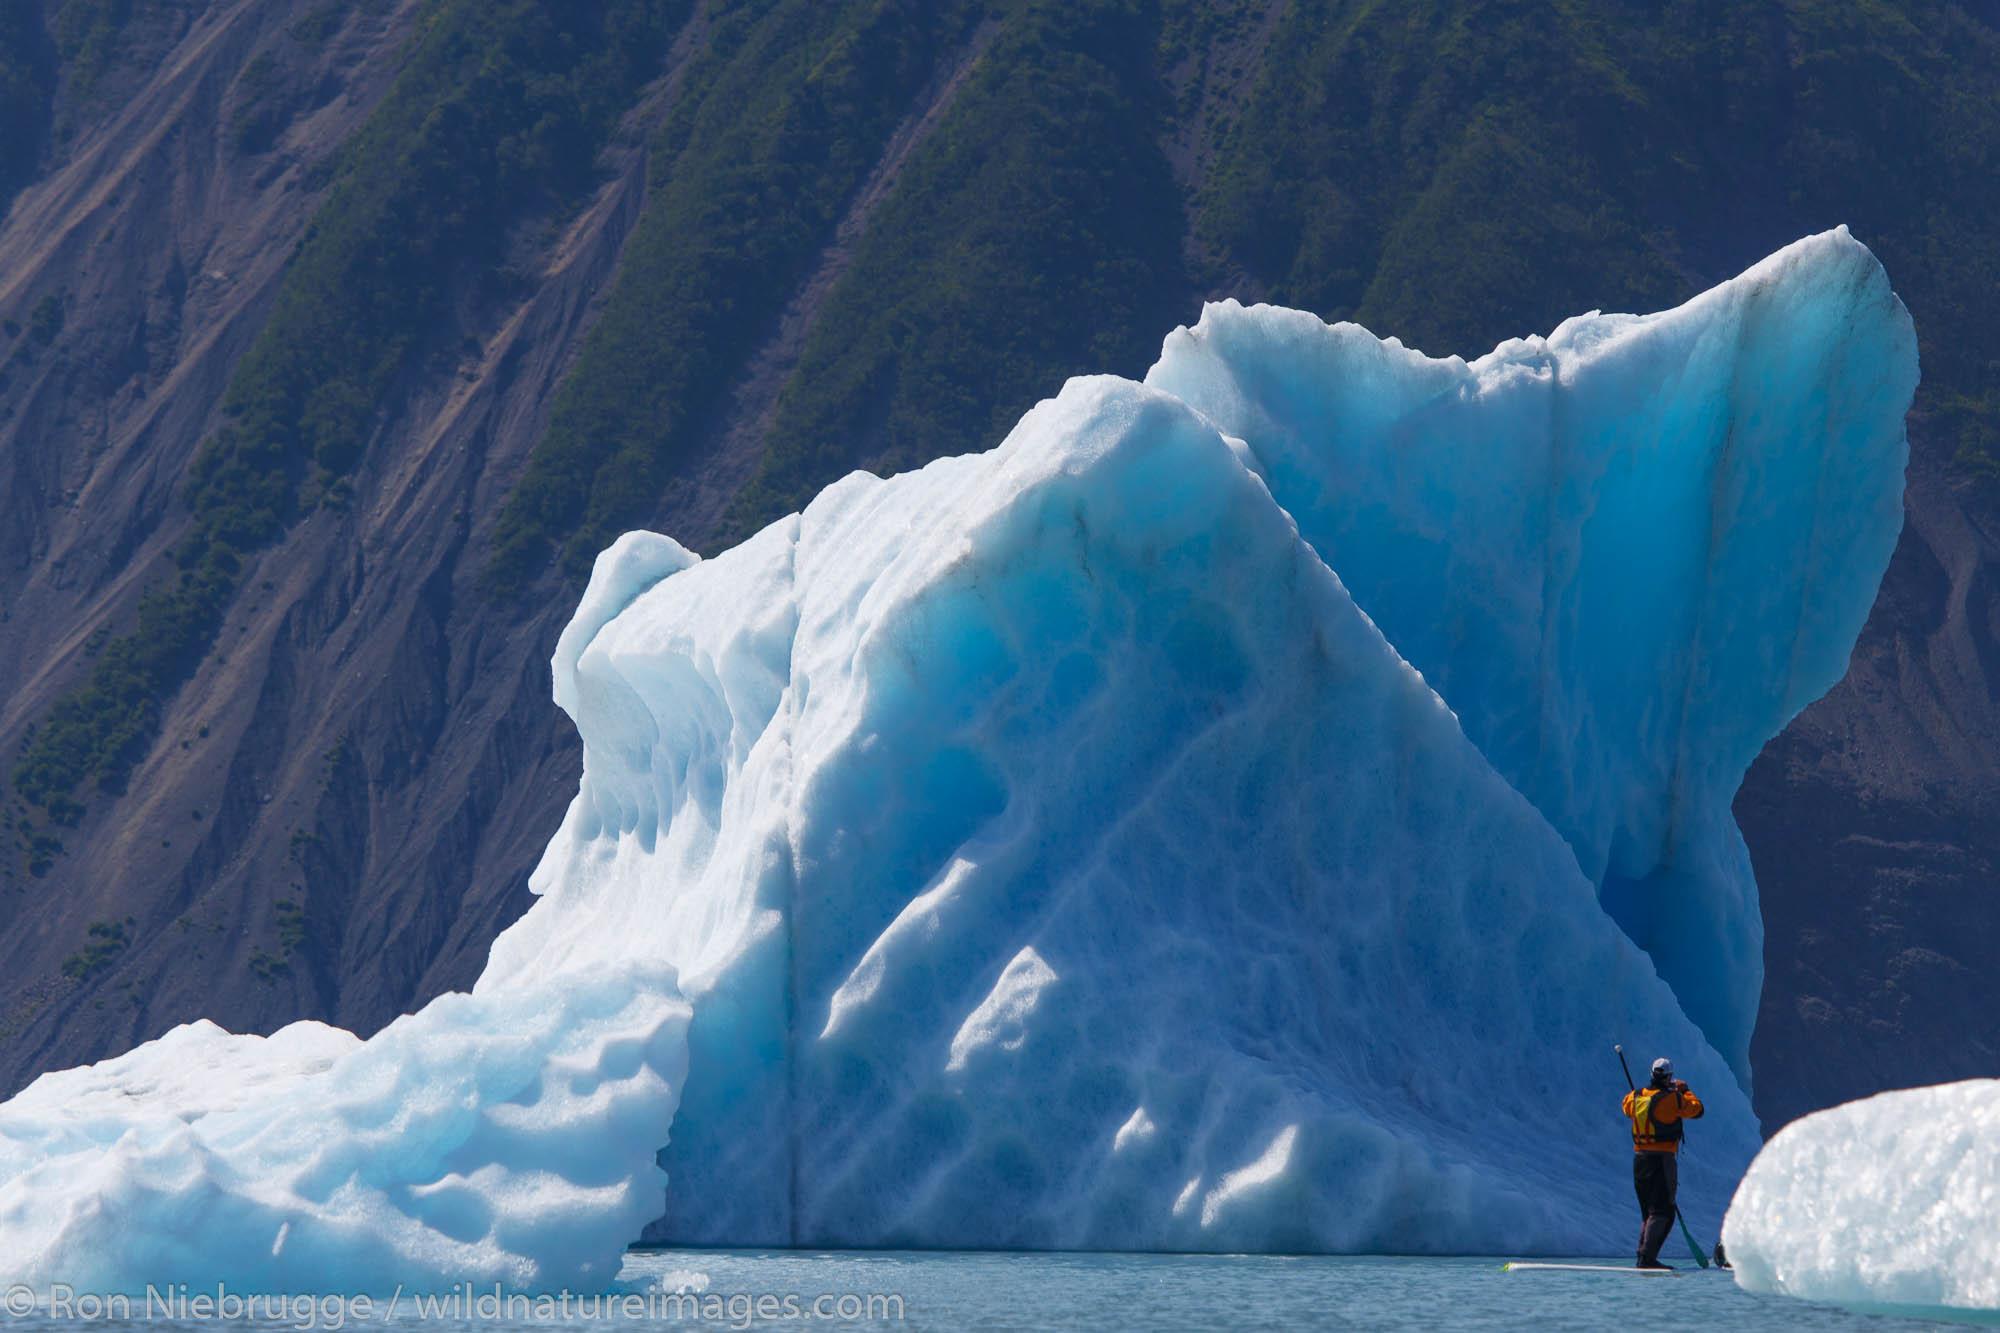 Stand up paddle boarders in Bear Glacier Lagoon, Kenai Fjords National Park, near Seward, Alaska.